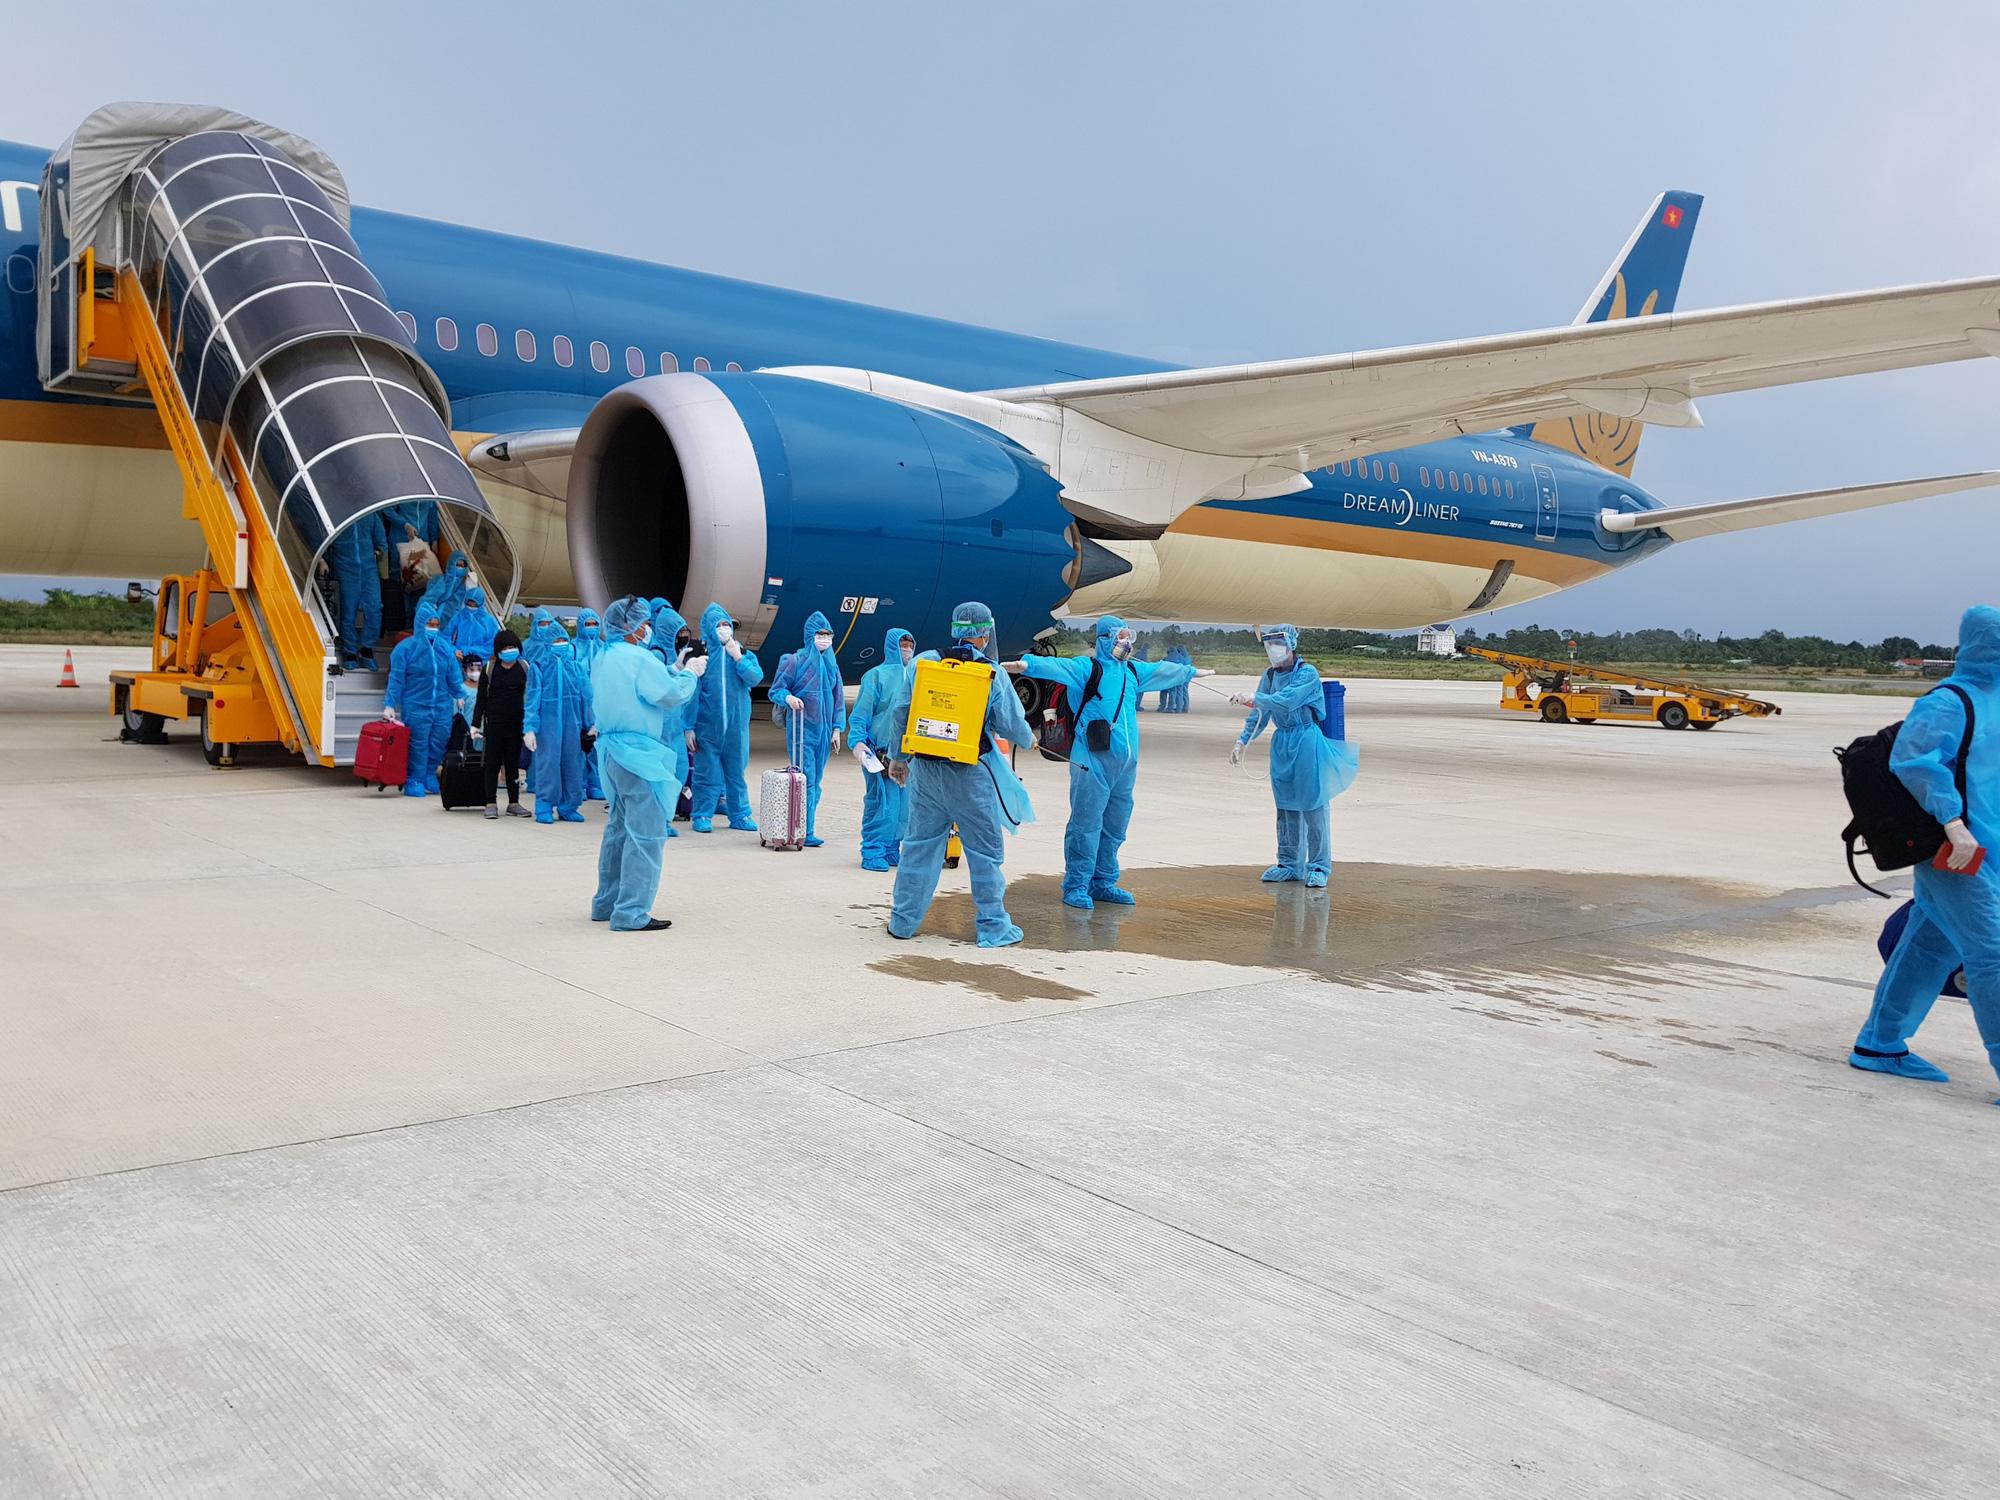 Price of COVID-19 repatriation flight can top $431,000: Vietnam Airlines